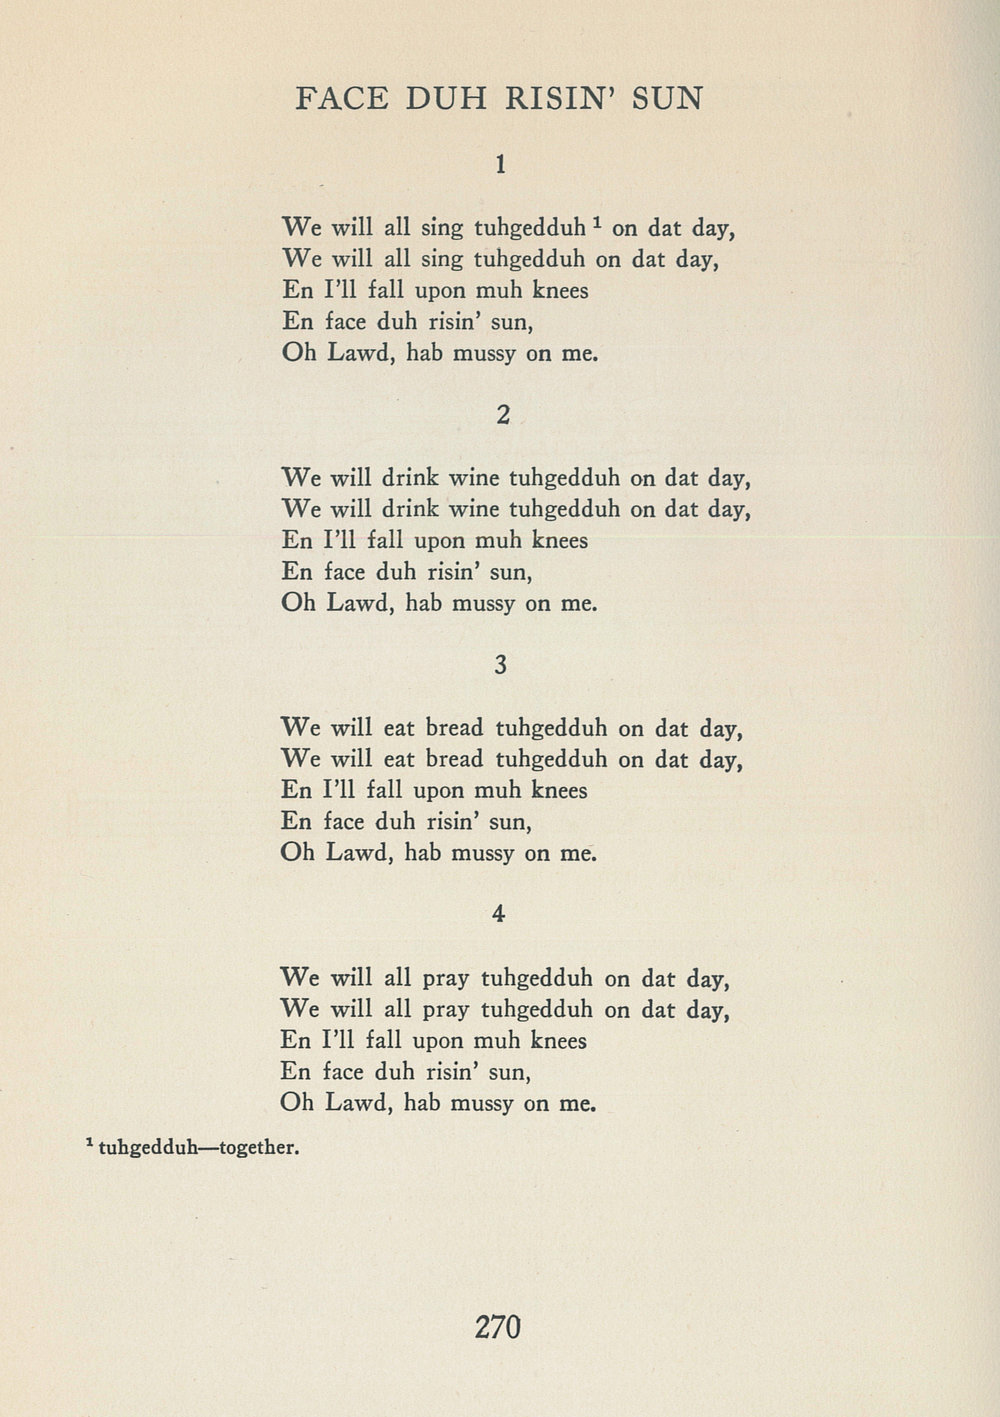 LetUsBreak-CarolinaLowCountry-1931_001a.jpg